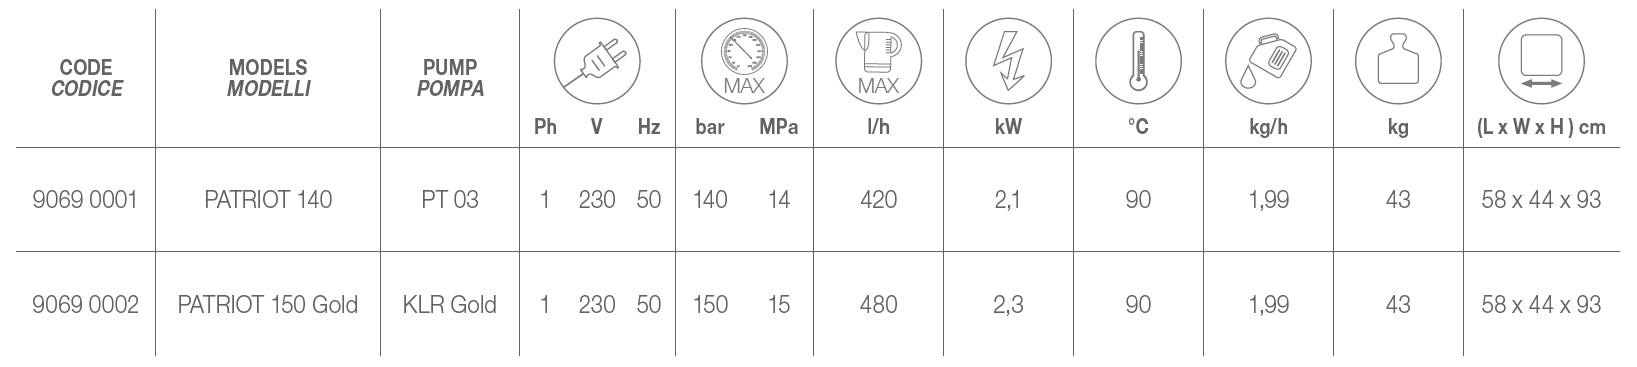 PATRIOT Technical Data